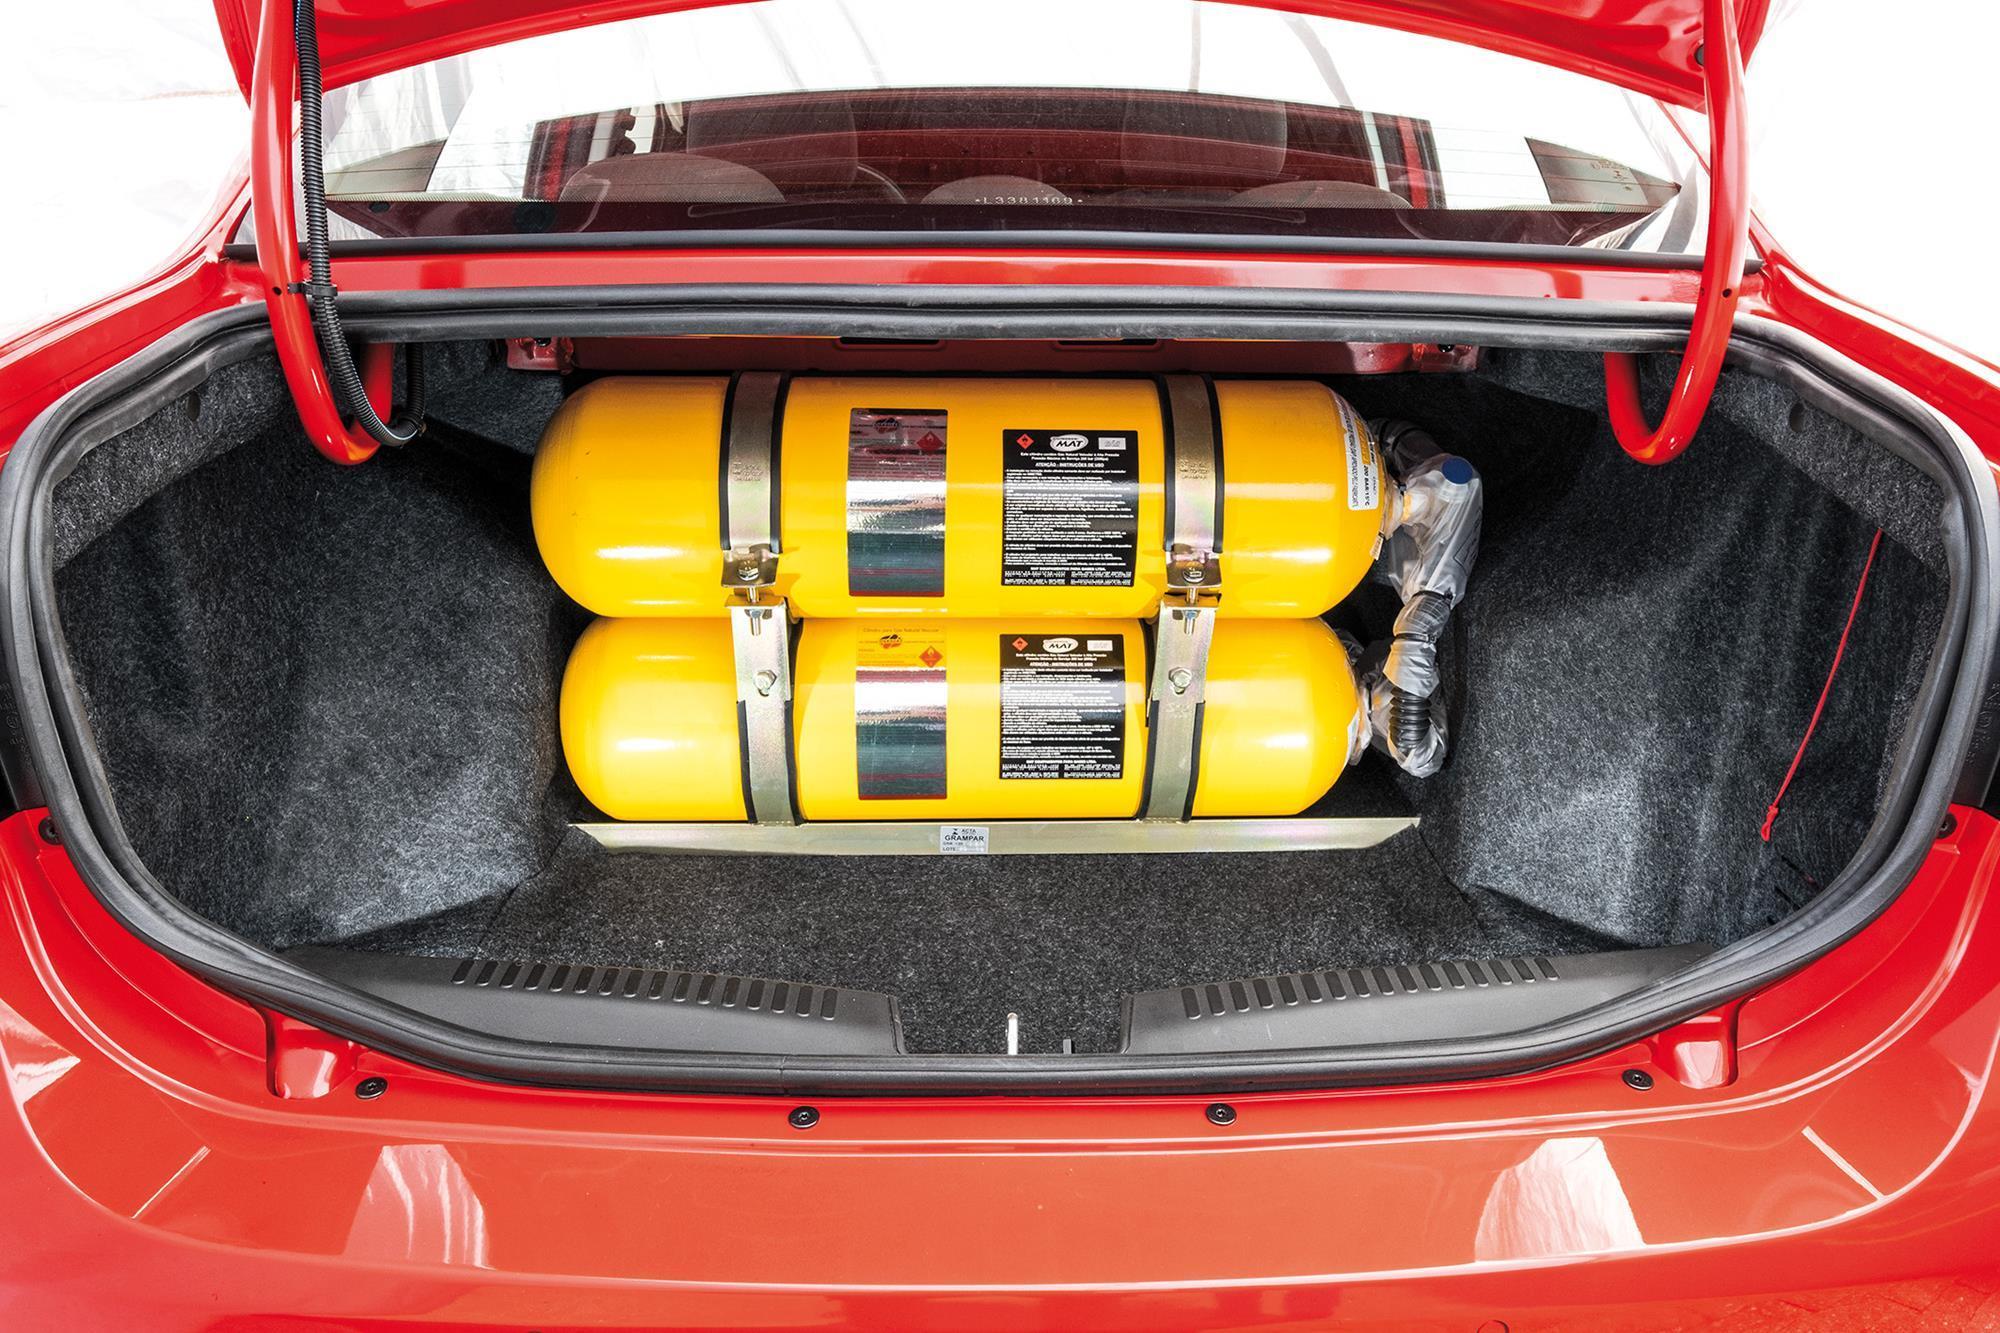 Fiat Grand Siena 1.4 Attractive preparação para GNV (11)